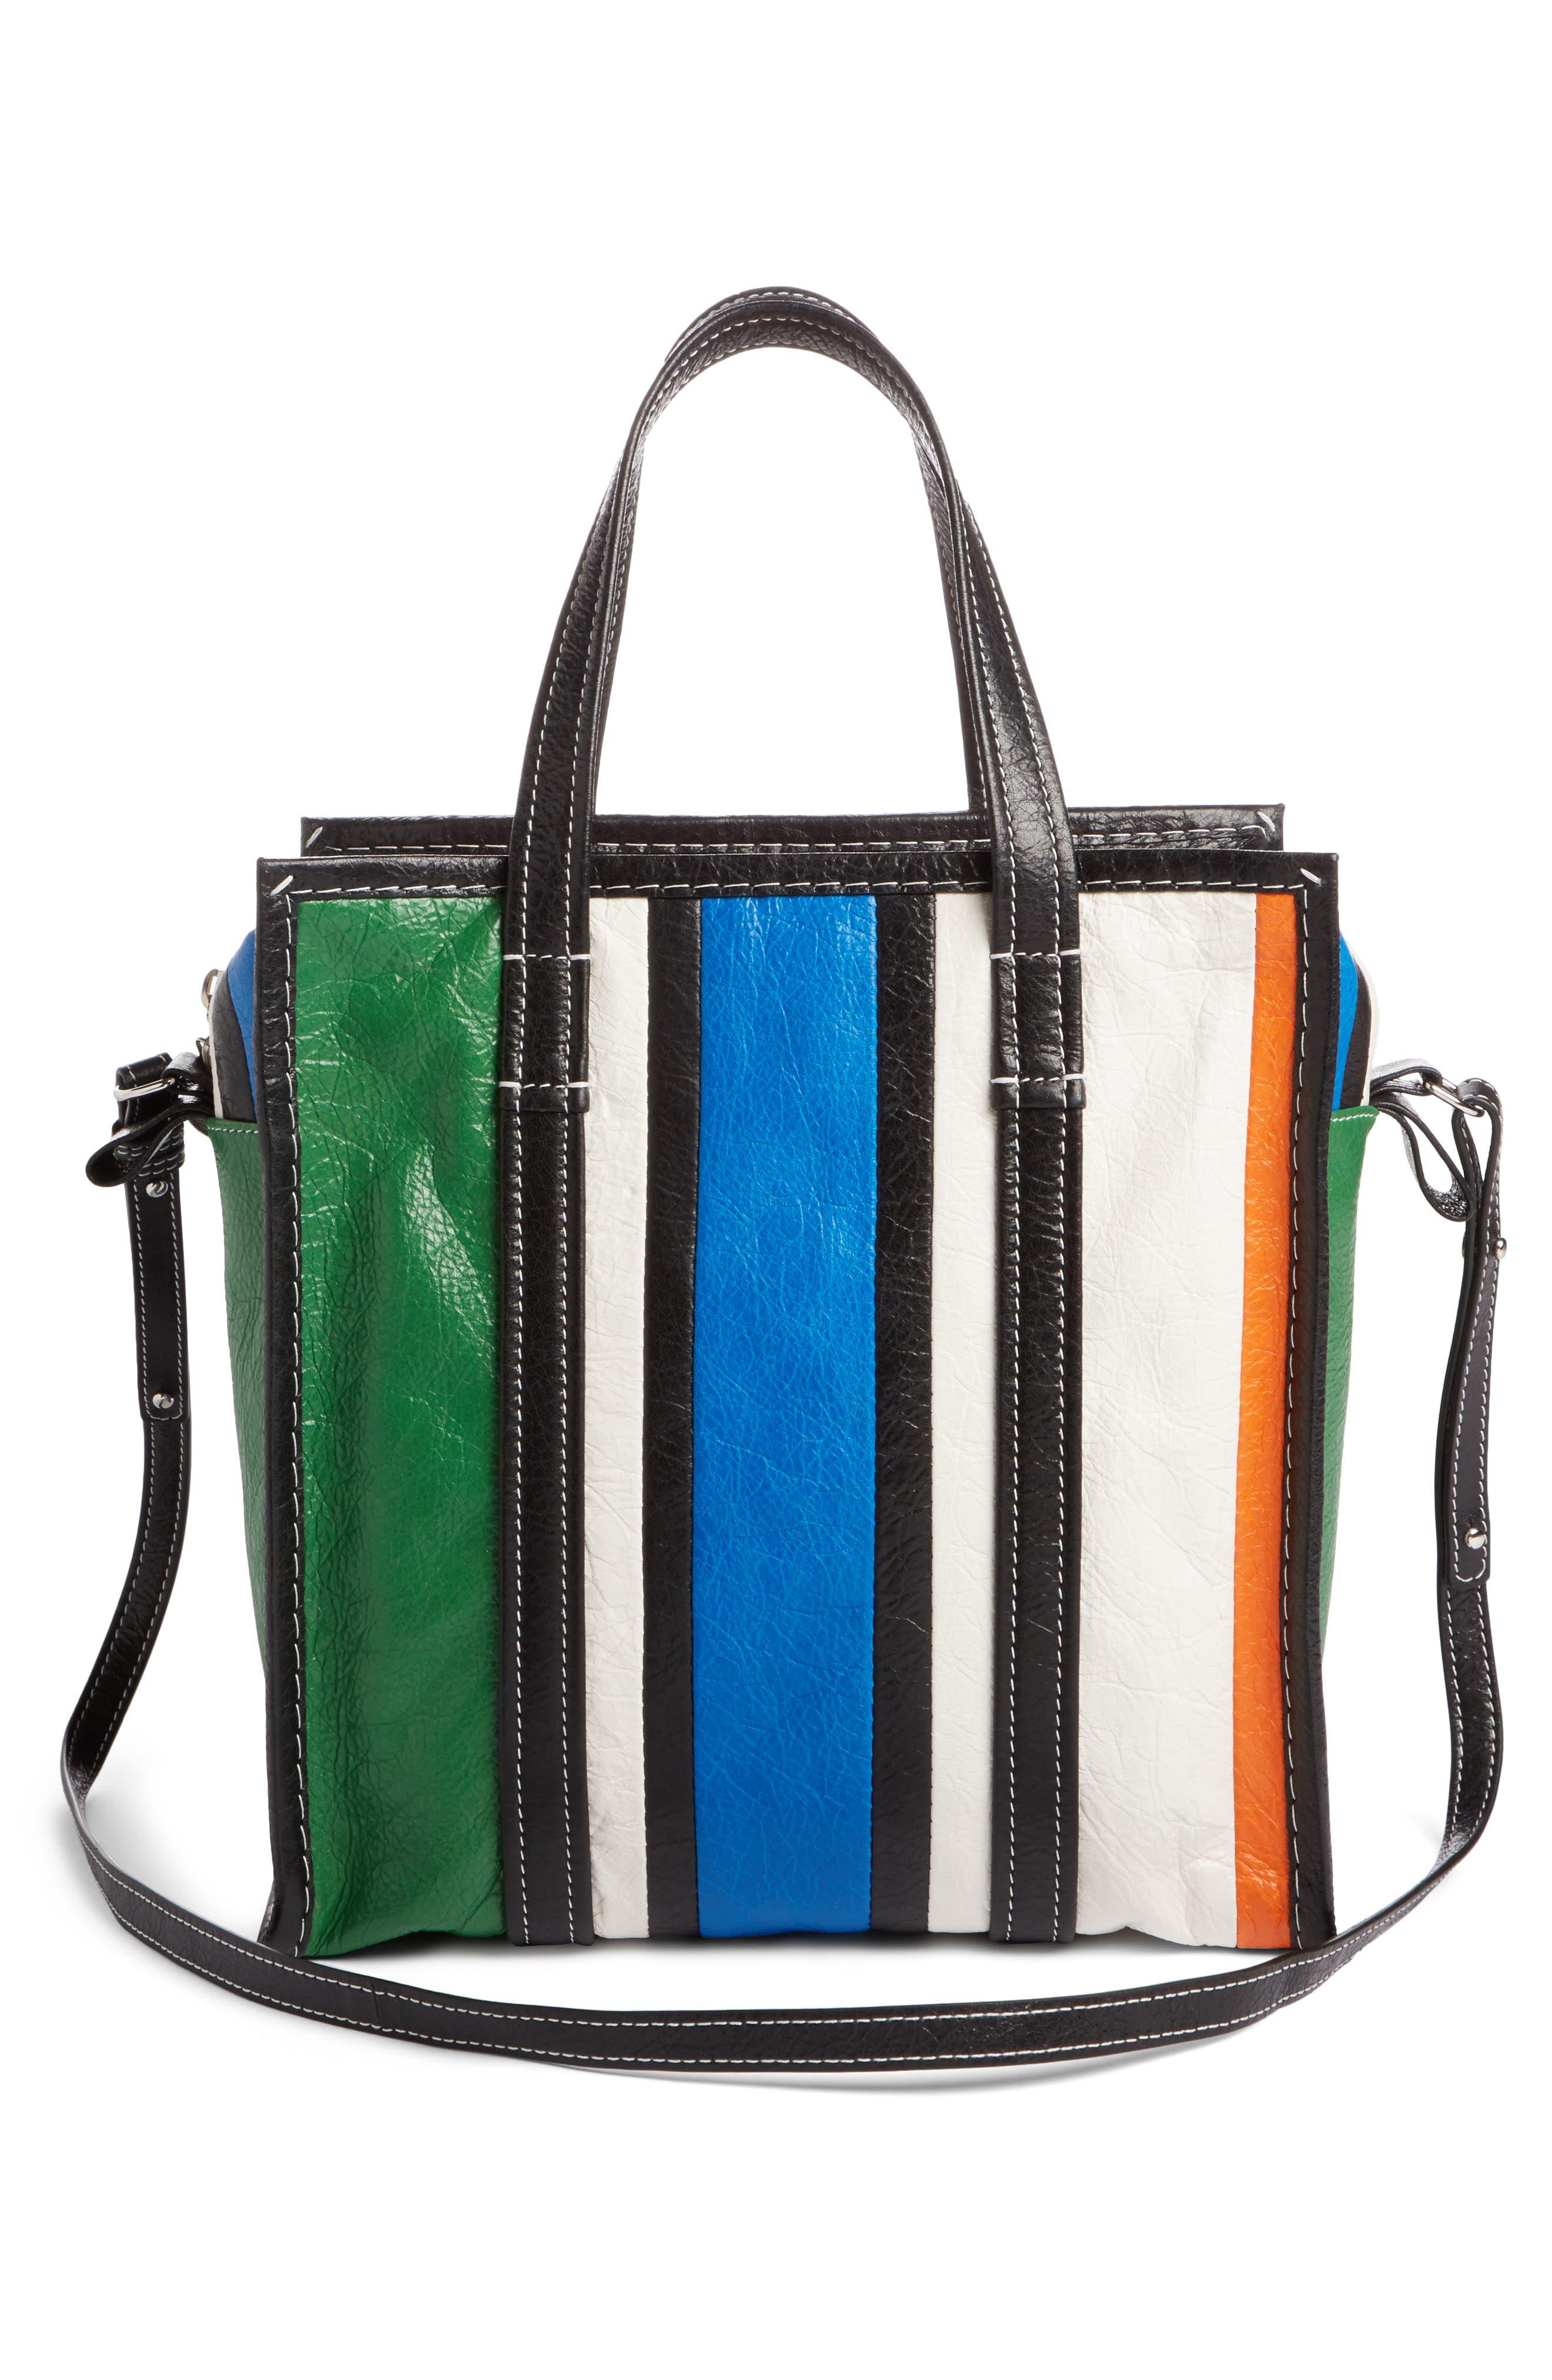 Extra Small Bazar Leather Shopper,                             Alternate thumbnail 2, color,                             Orange/ Blue/ Vert/ Navy